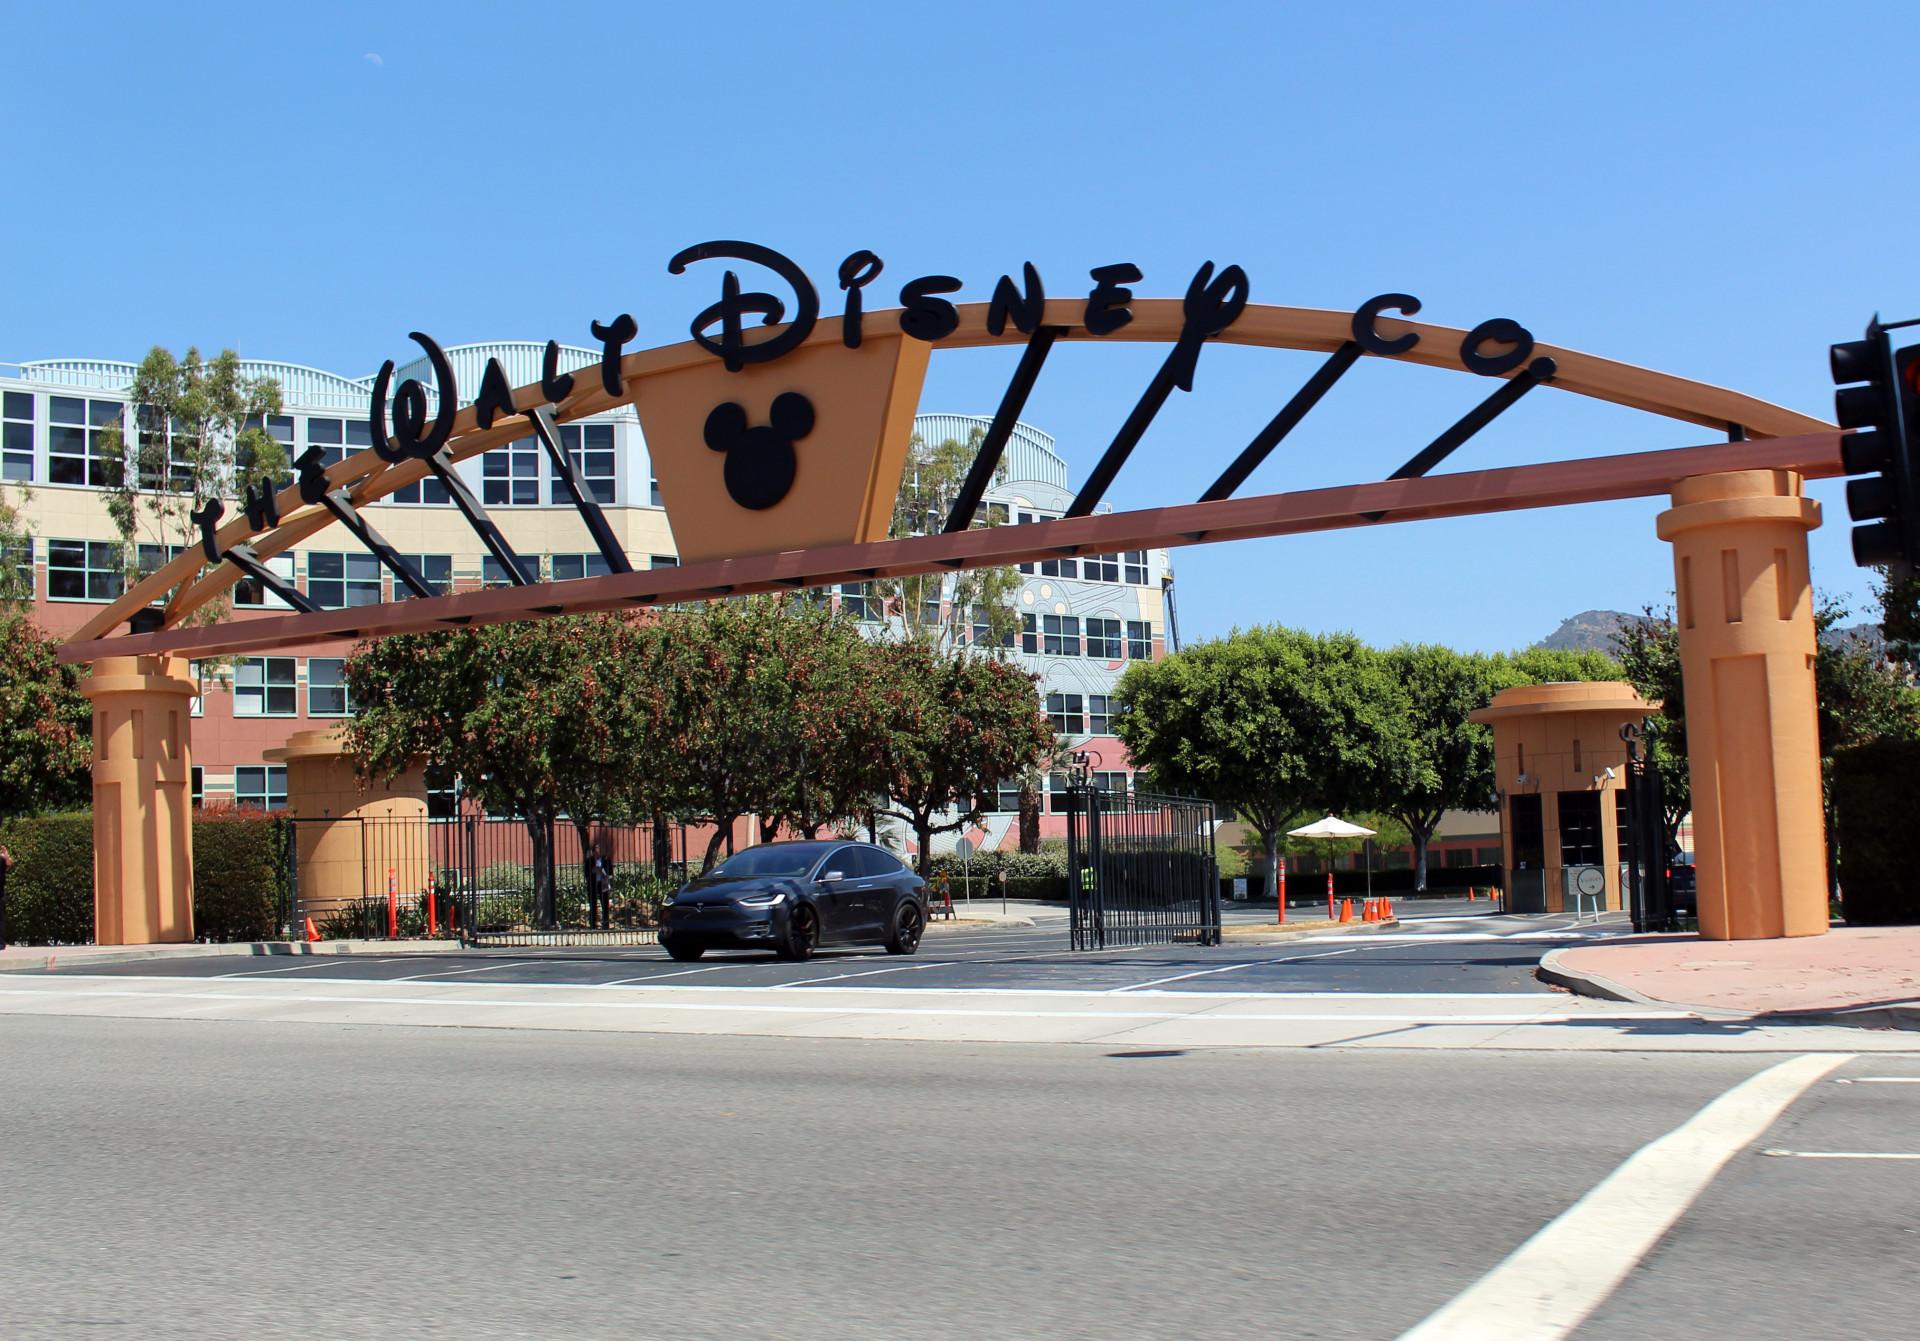 Disney: US-Videostreaming-Dienst kommt im November zum Kampfpreis